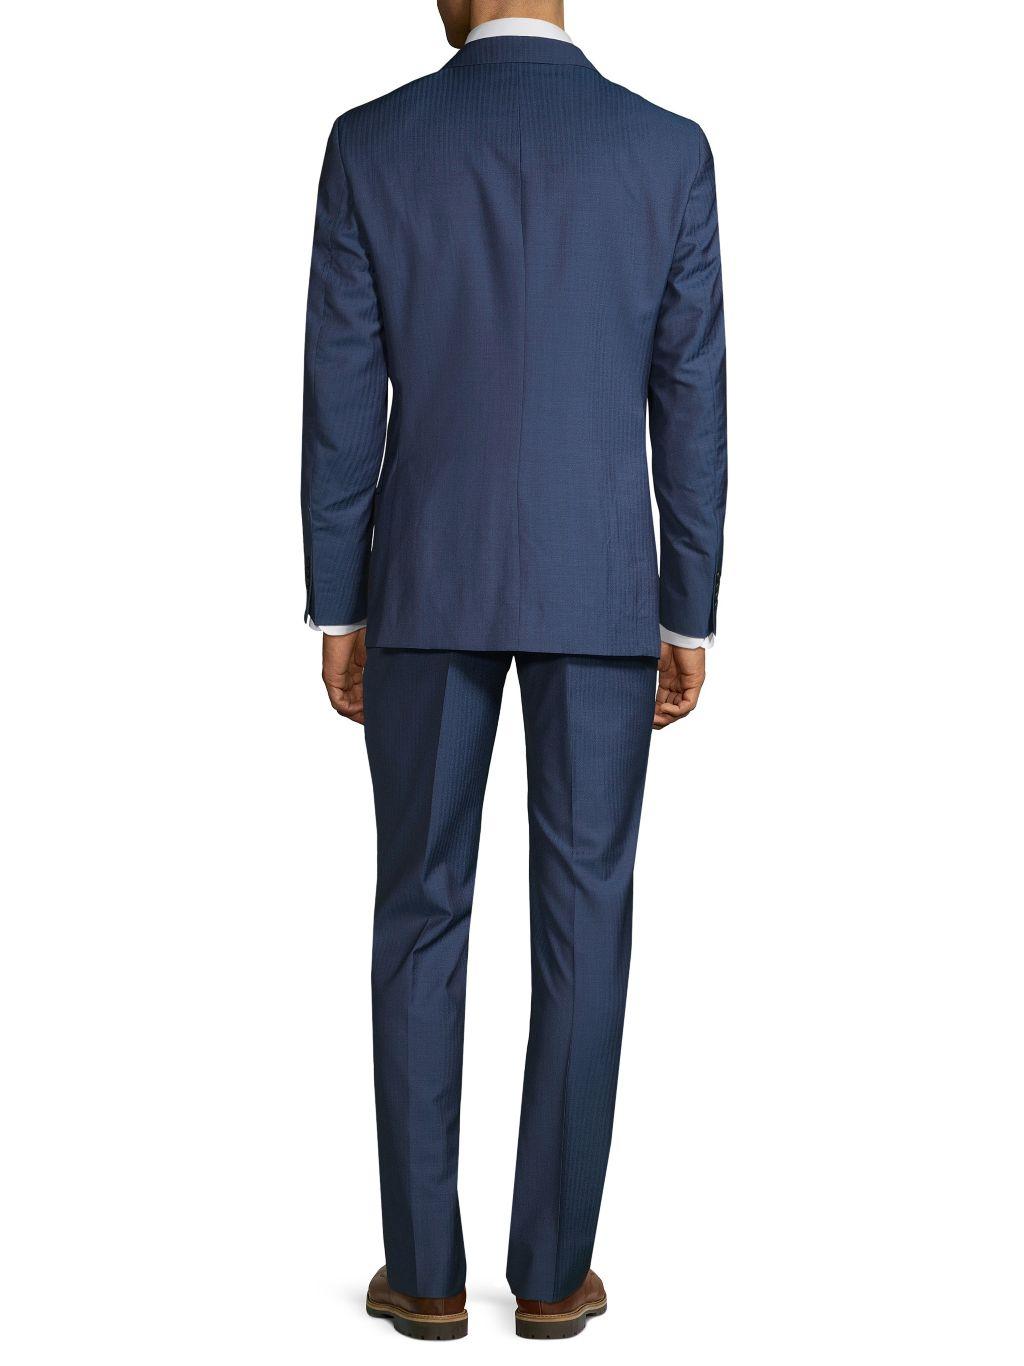 Saks Fifth Avenue Made in Italy Slim-Fit Wool & Silk Suit